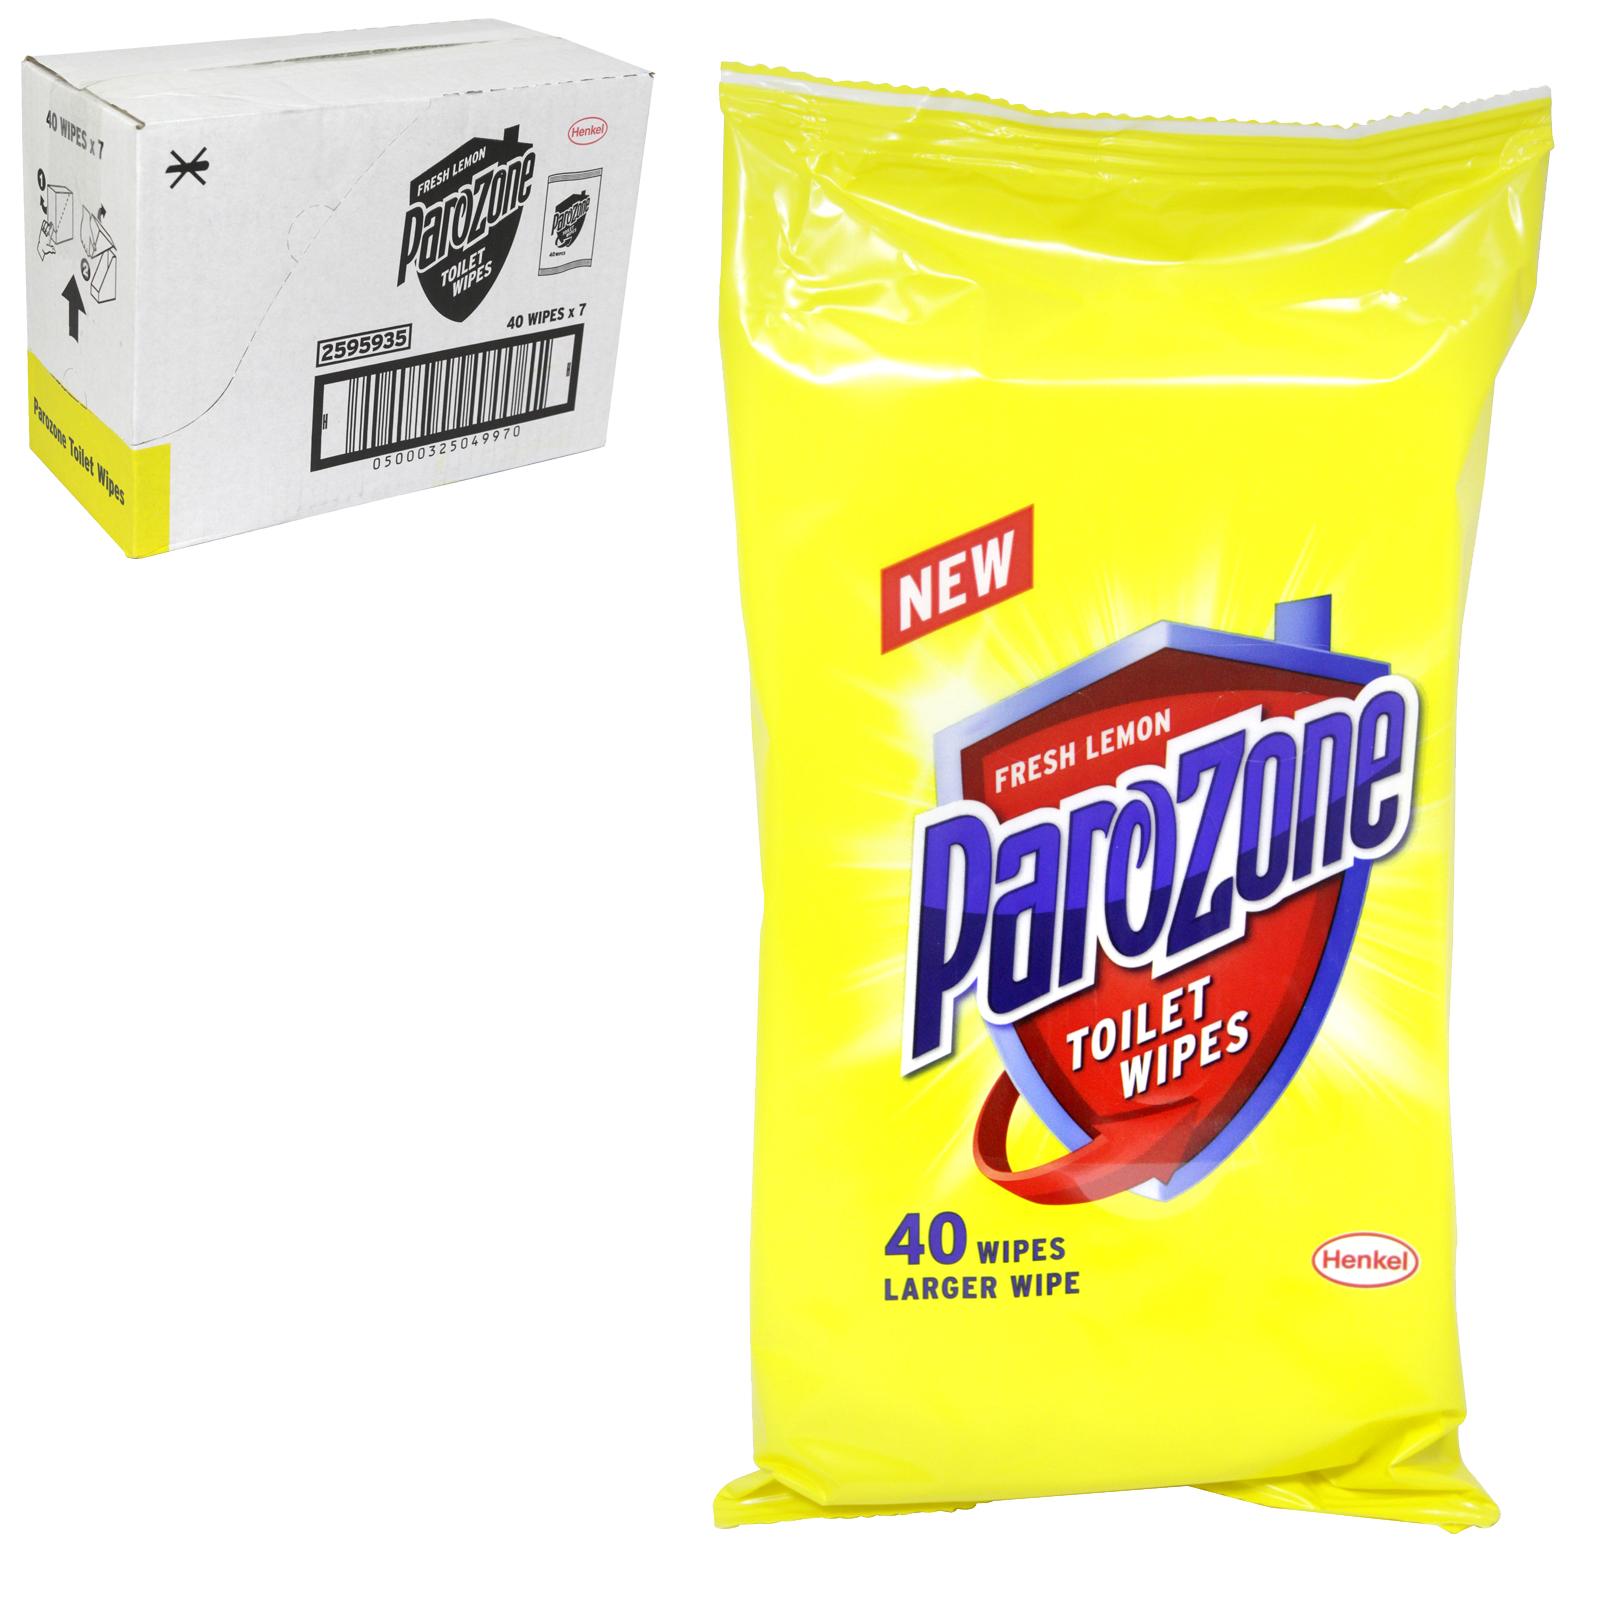 PAROZONE TOILET WIPES 40S FRESH LEMON X7